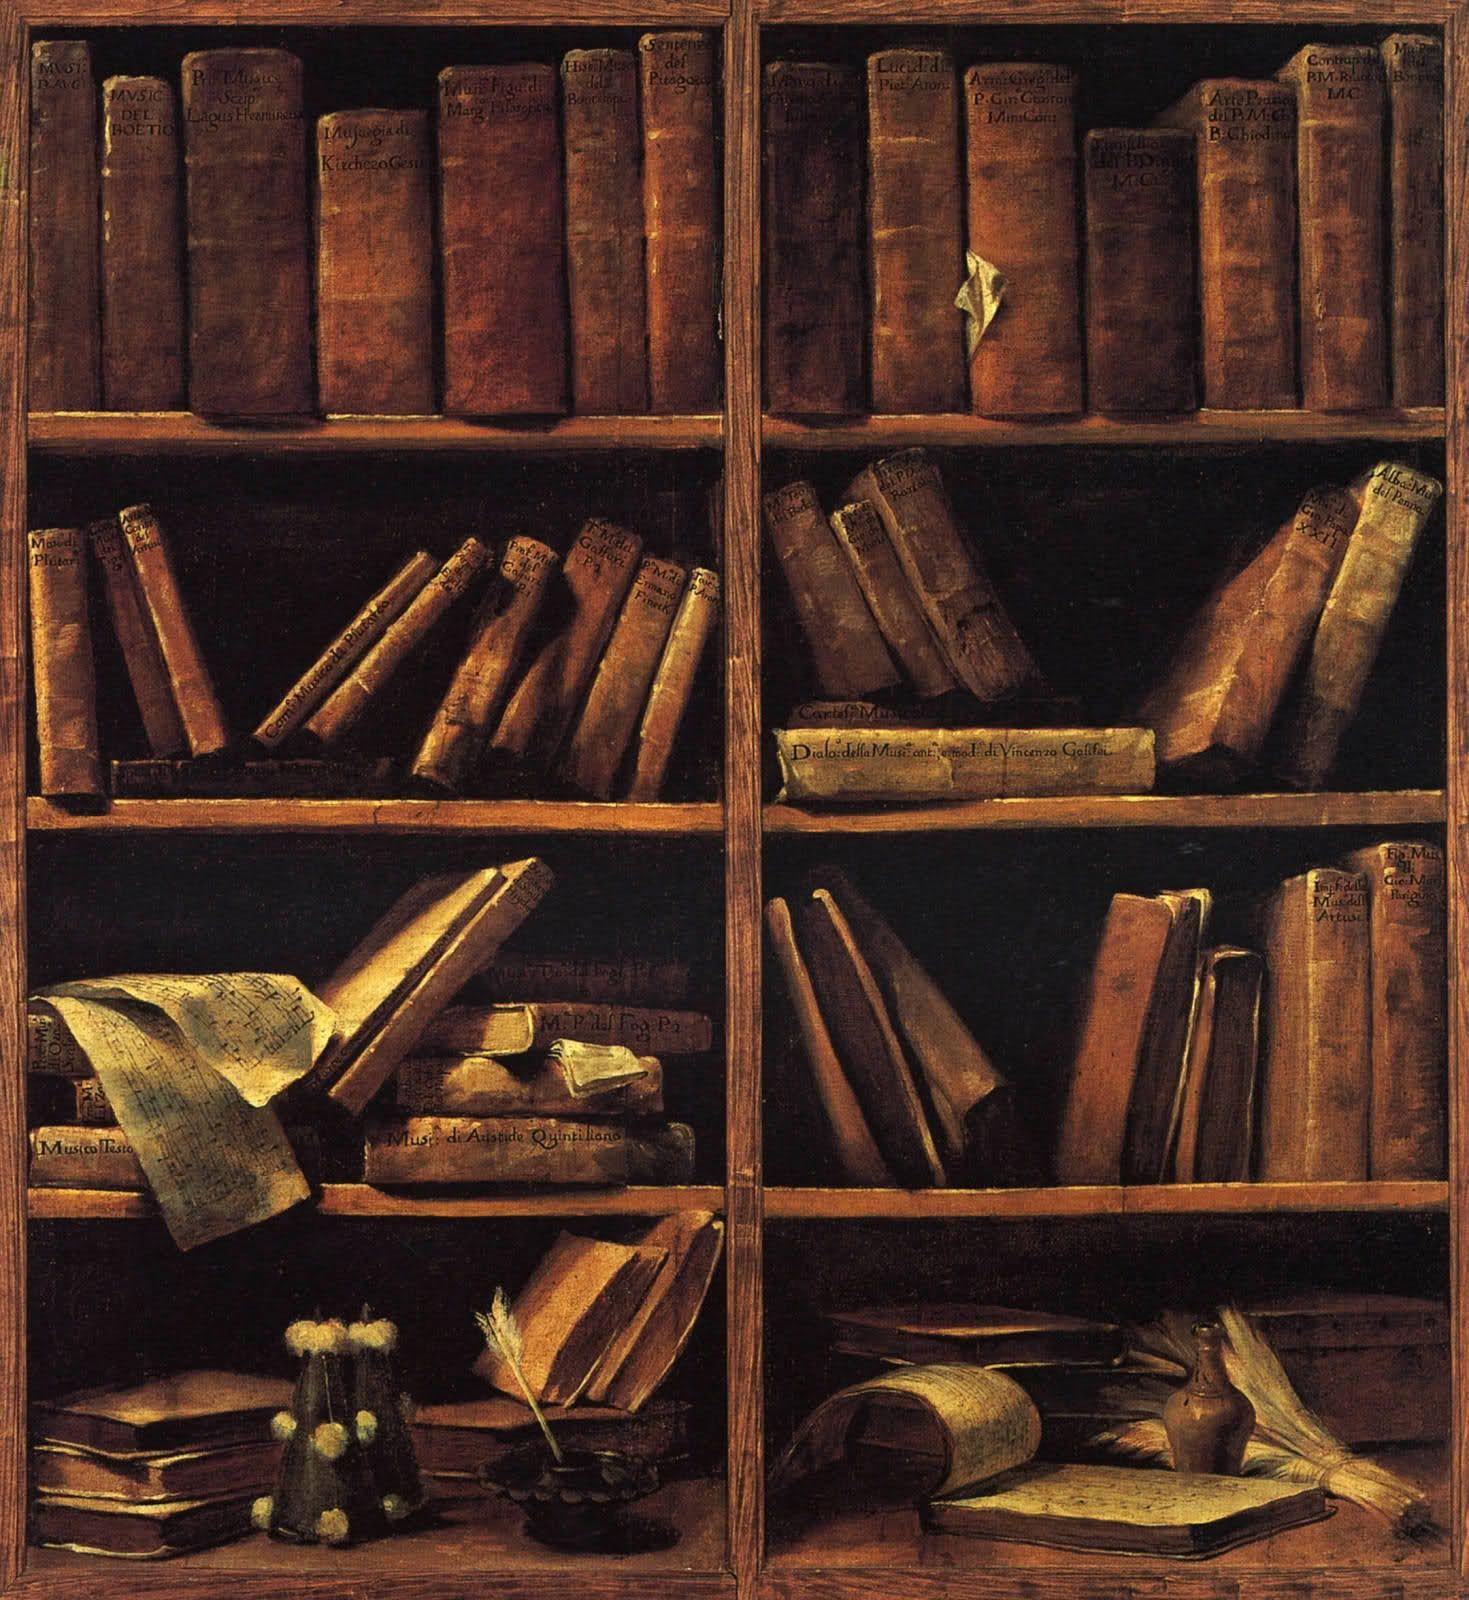 Free Images : wood, antique, shelf, furniture, bookcase ... |Old Bookshelf With Books